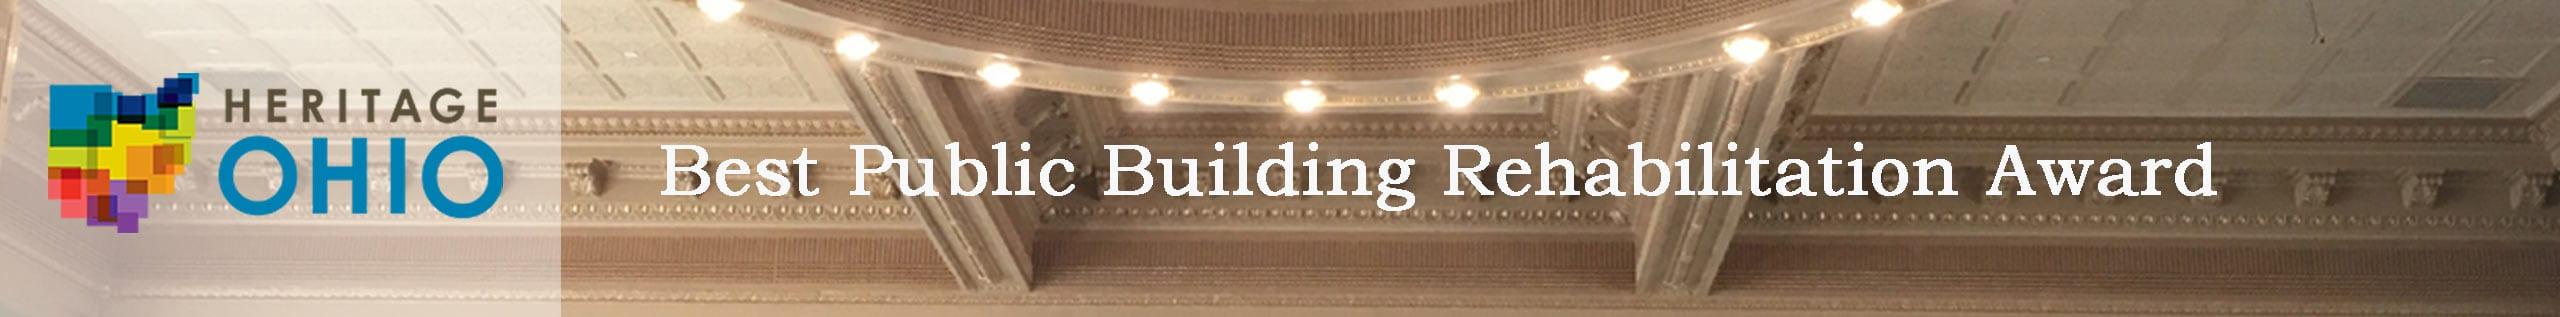 Fulton County Courthouse recognized with the 2020 Heritage Ohio Best Public Building Rehabilitation Award